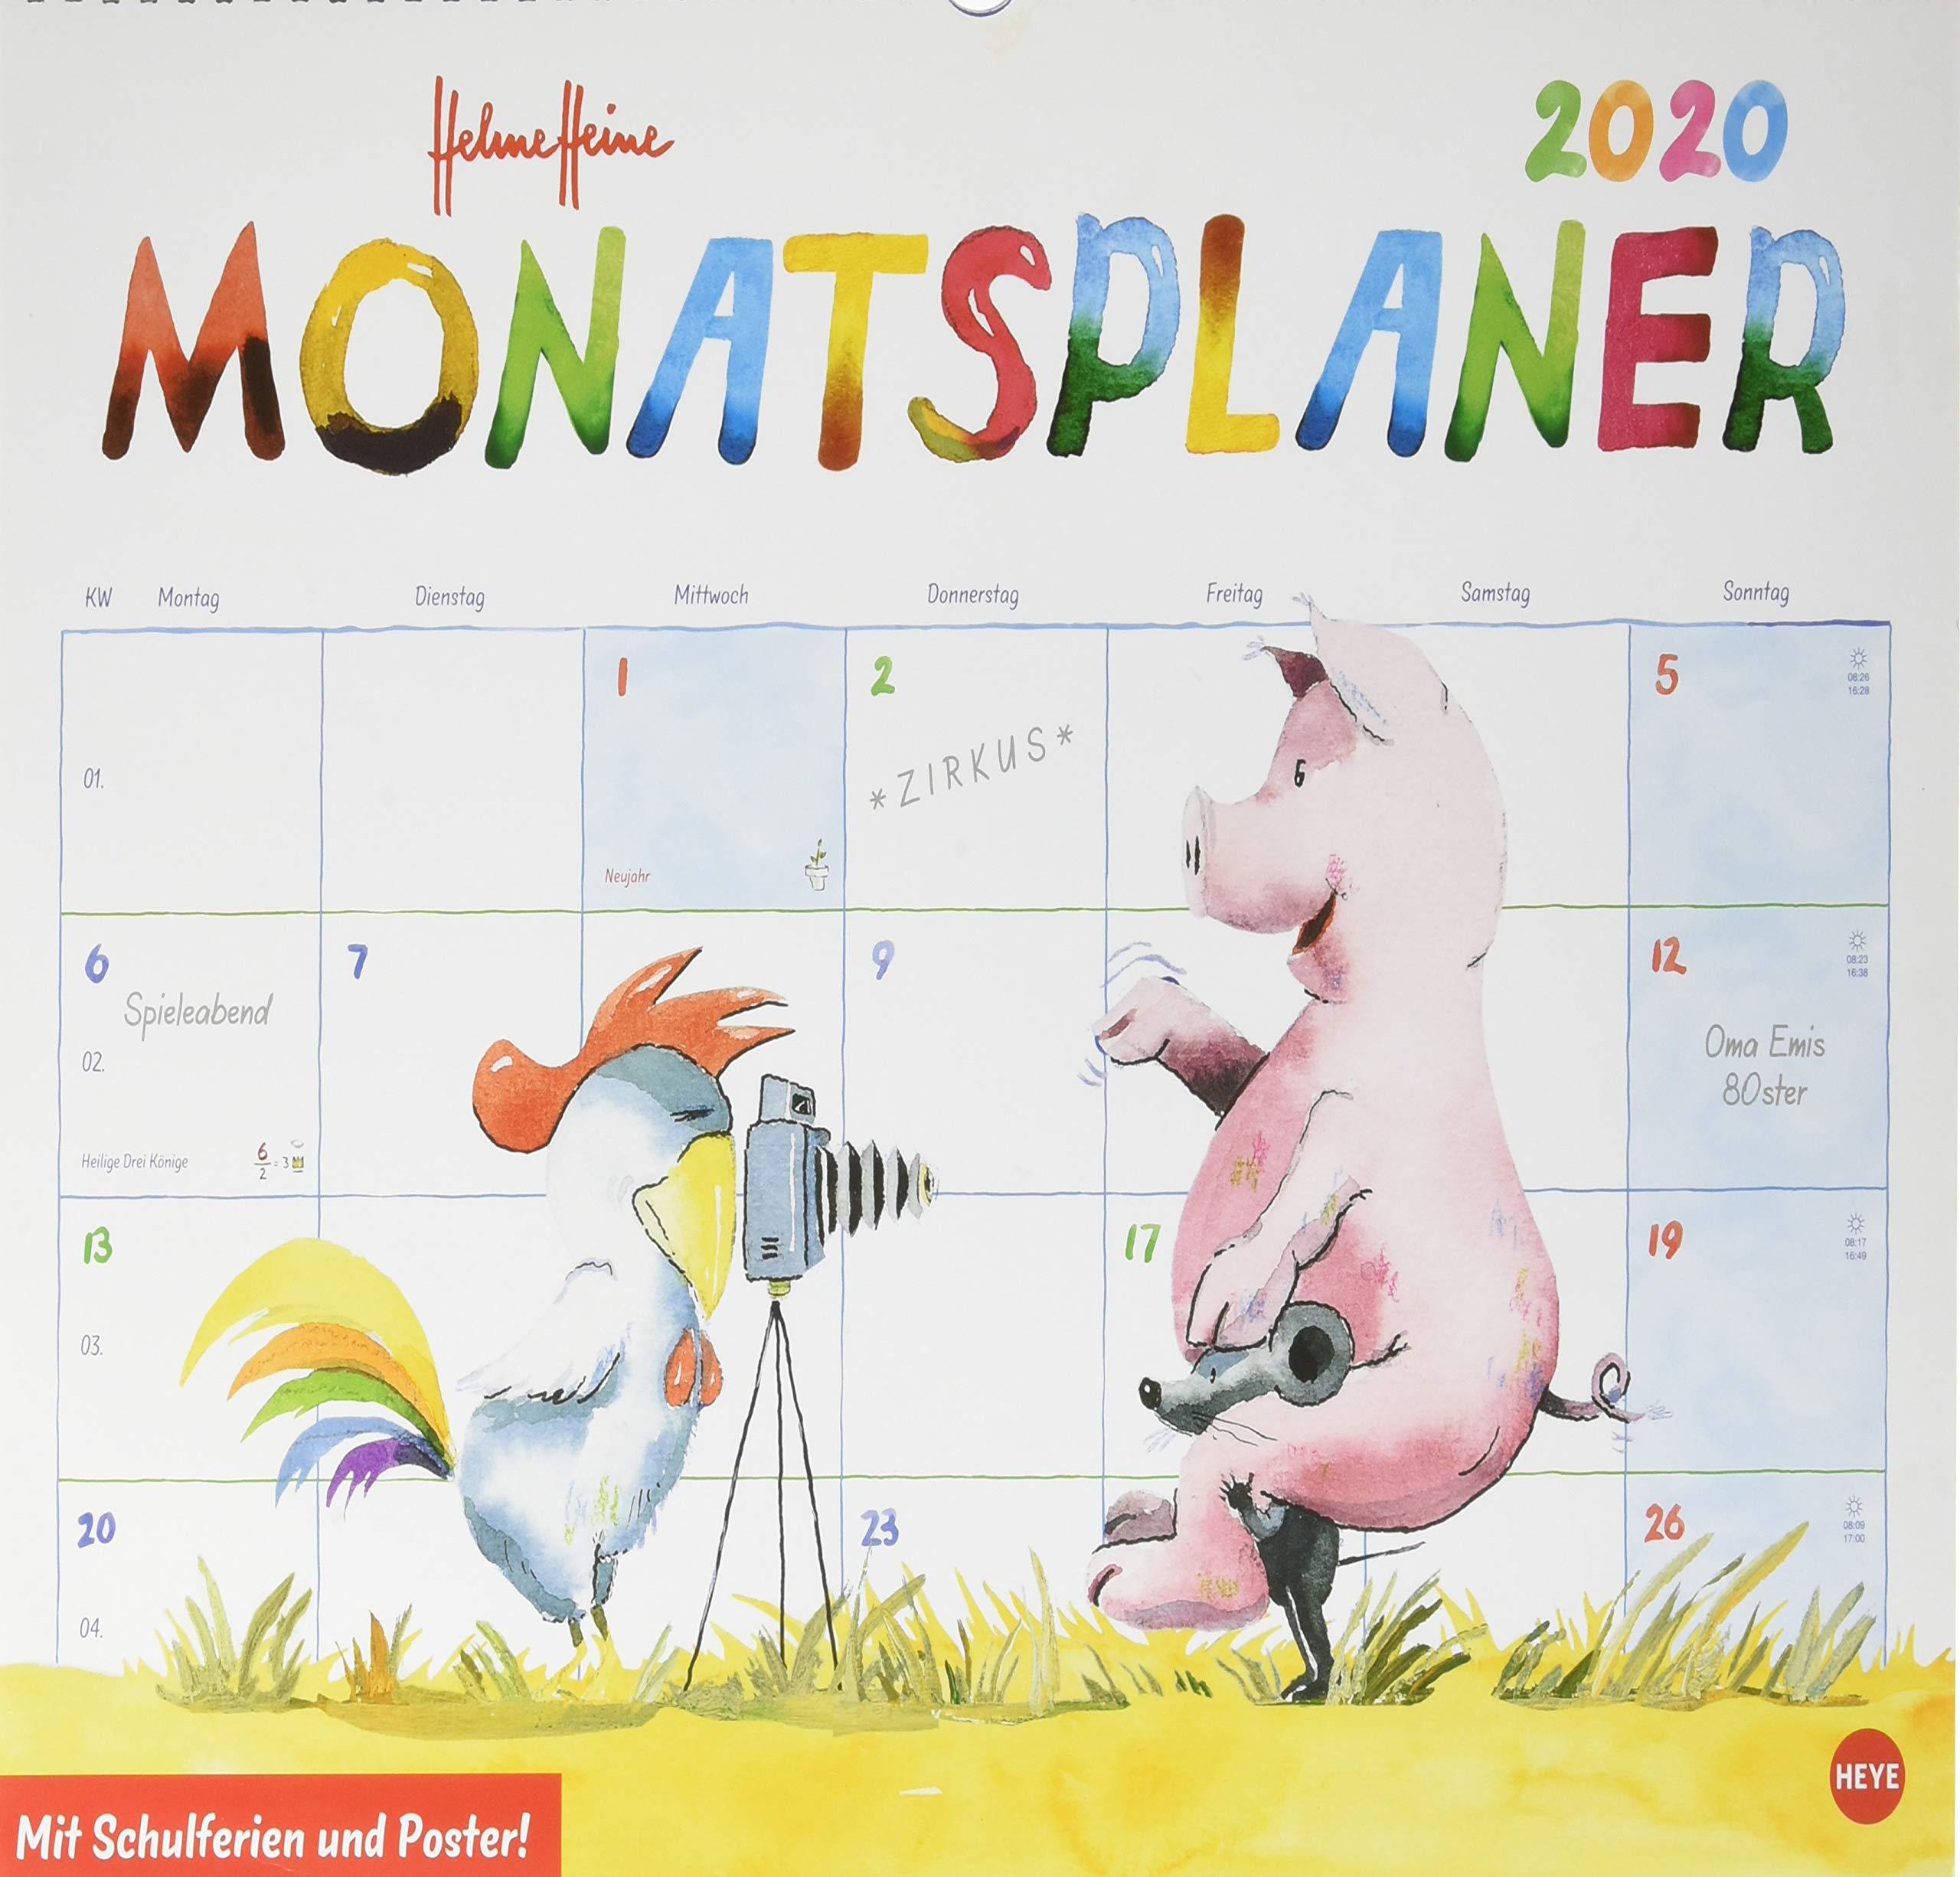 Helme Heine Monatsplaner. Wandkalender 2020. Monatskalendarium. Spiralbindung. Format 44 X 34 Cm